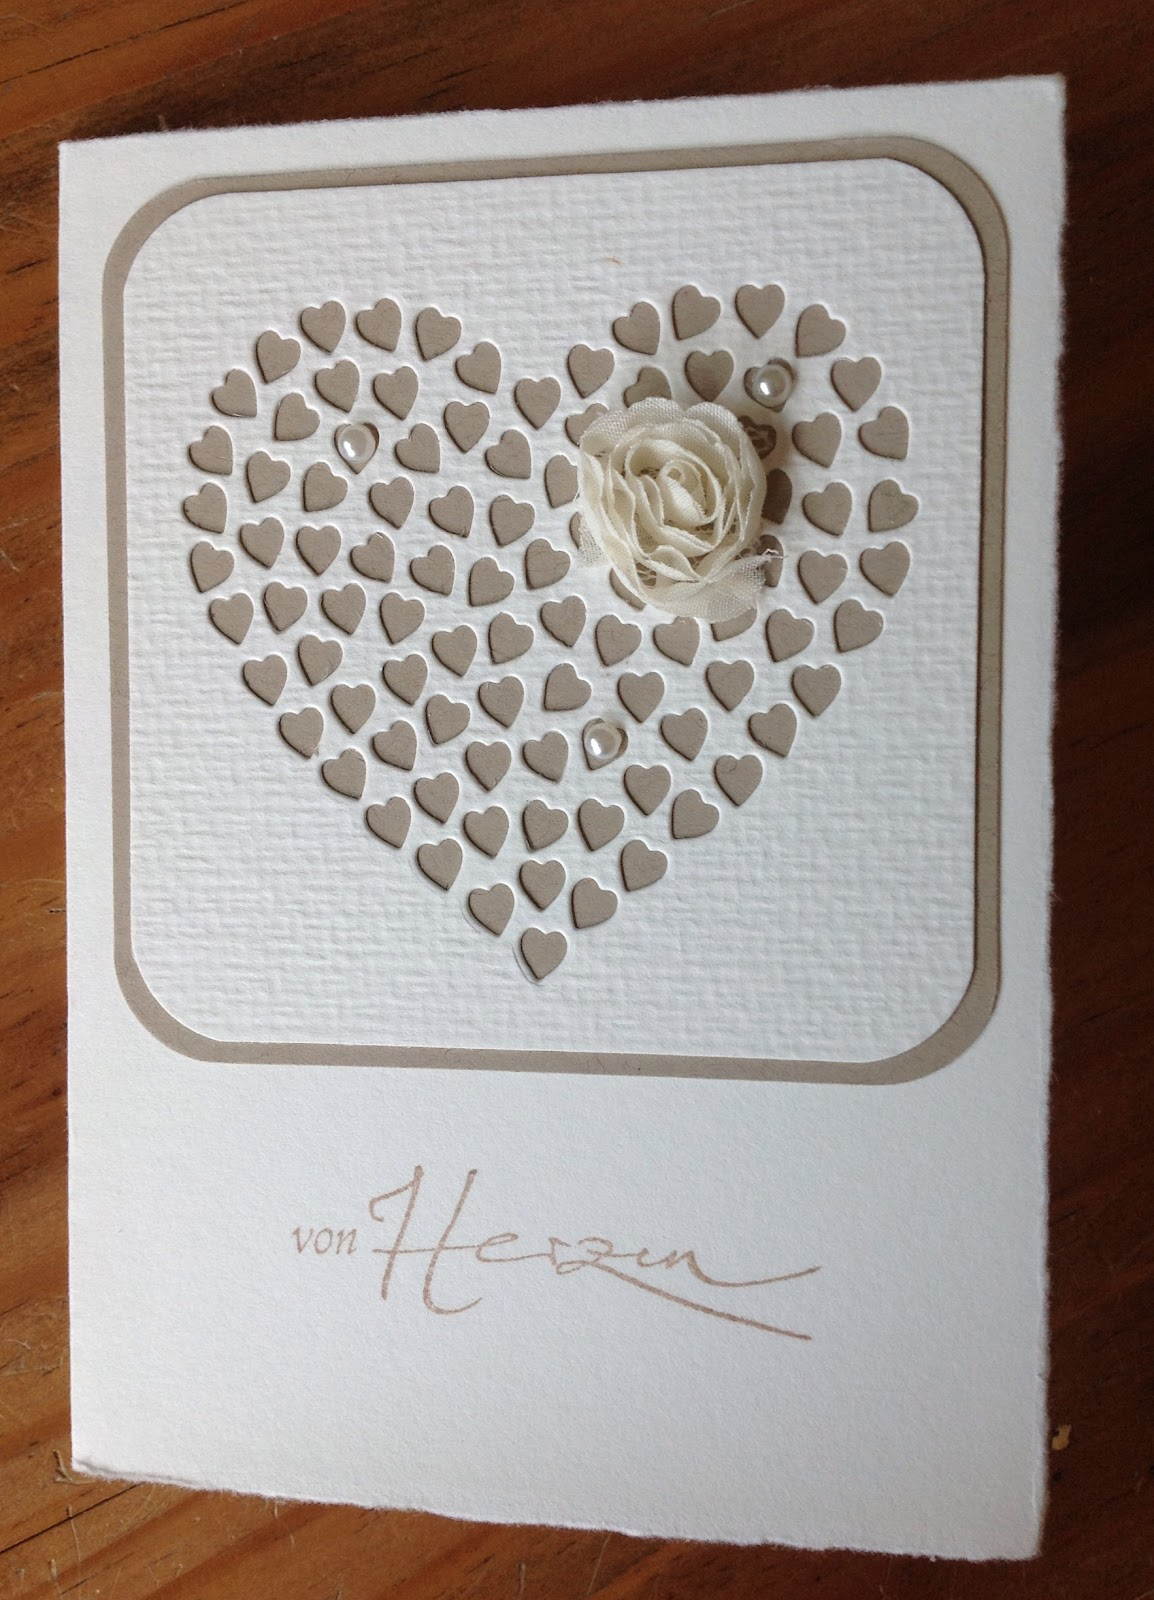 Memory Box Stanzform Herz aus Herzen, Schriftstempel Alexandra Renke